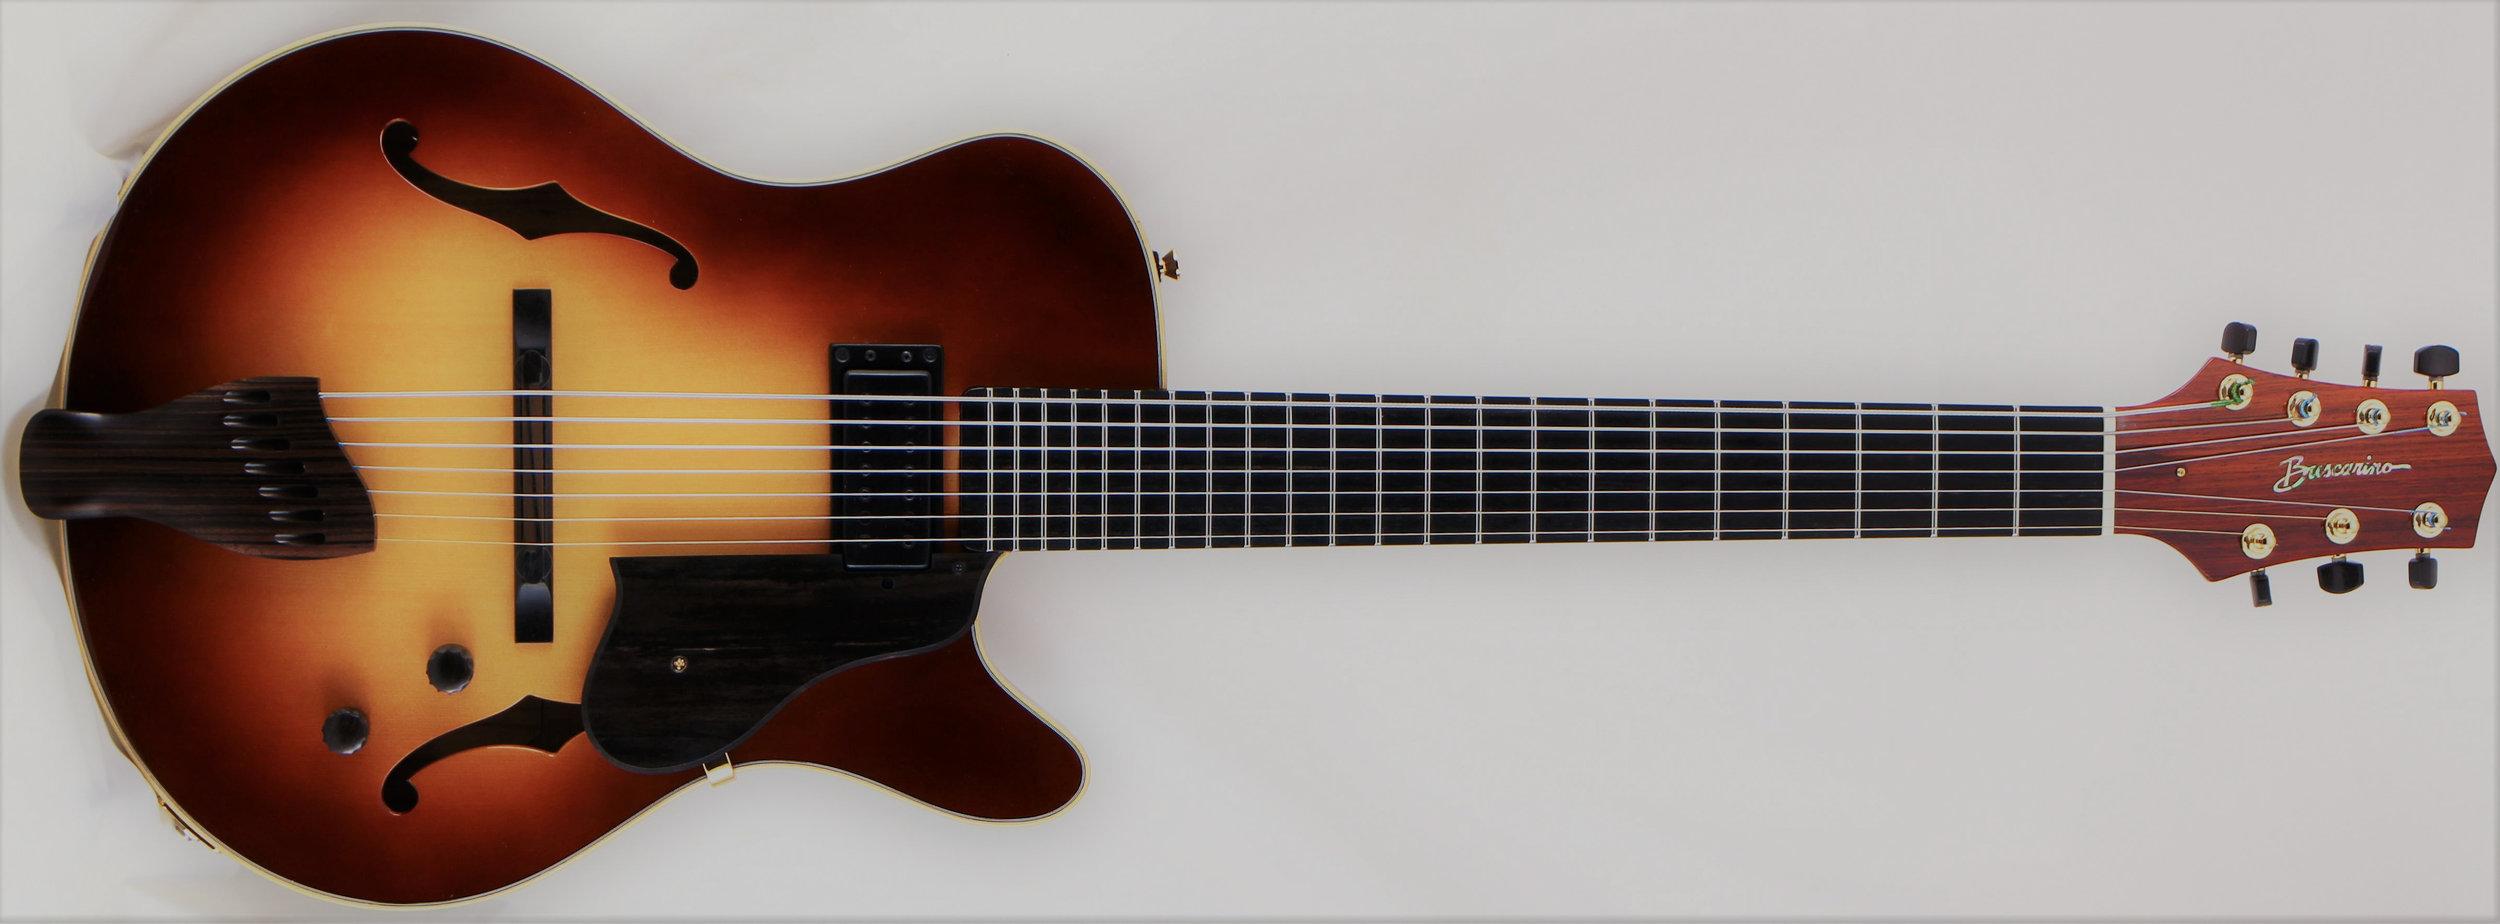 Mark White_Buscarino Guitar_Front